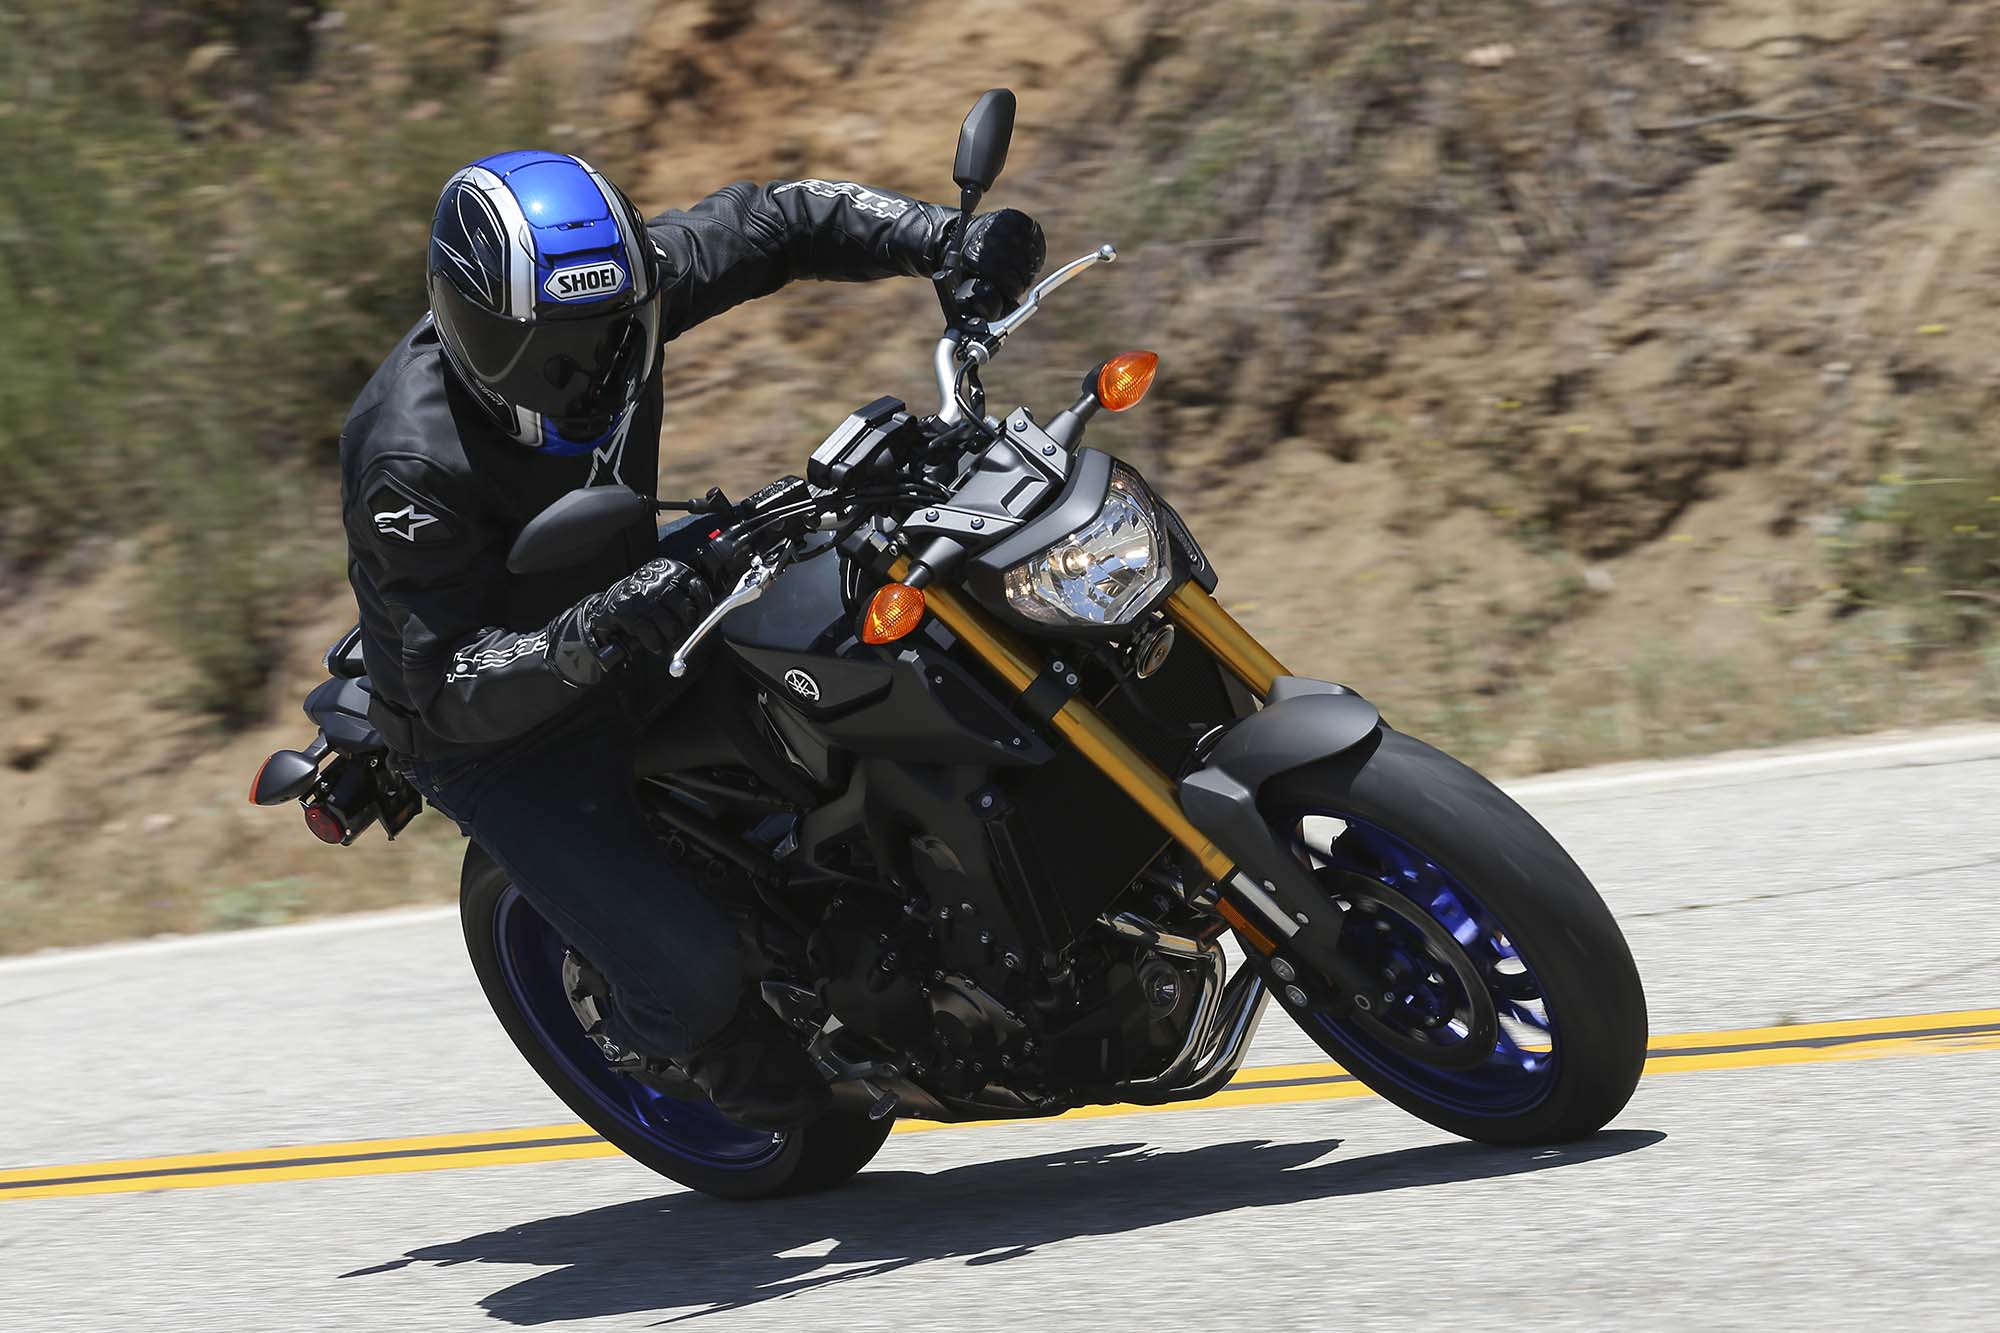 2014 Yamaha FZ-09 - Three Cylinders of Naked - Asphalt